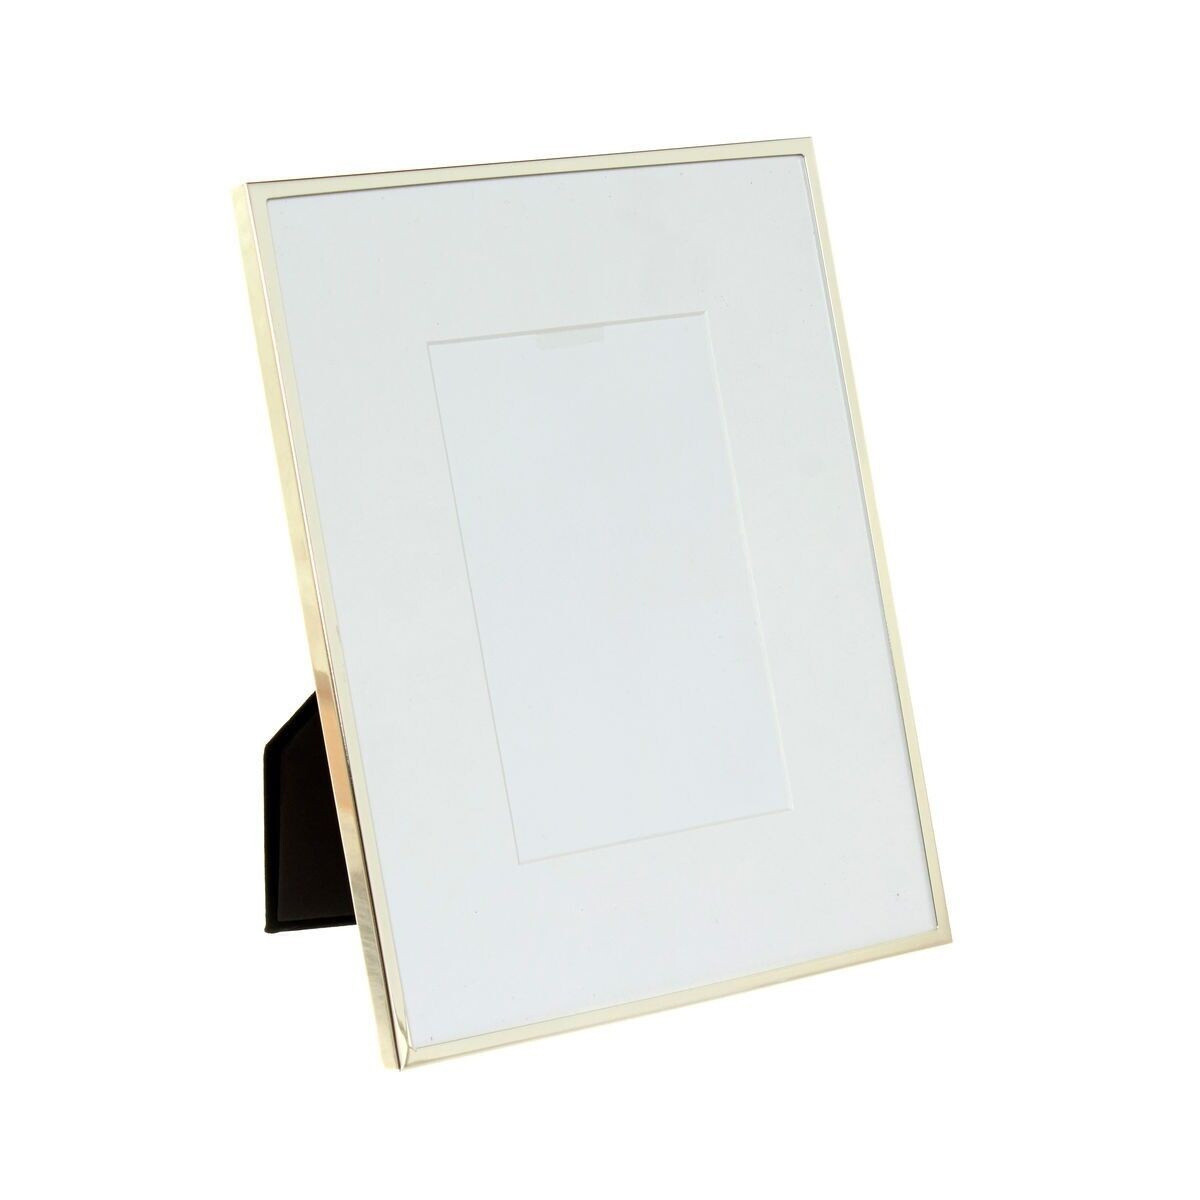 Portafoto silver plated con passepartout, Grigio argento, large image number 0